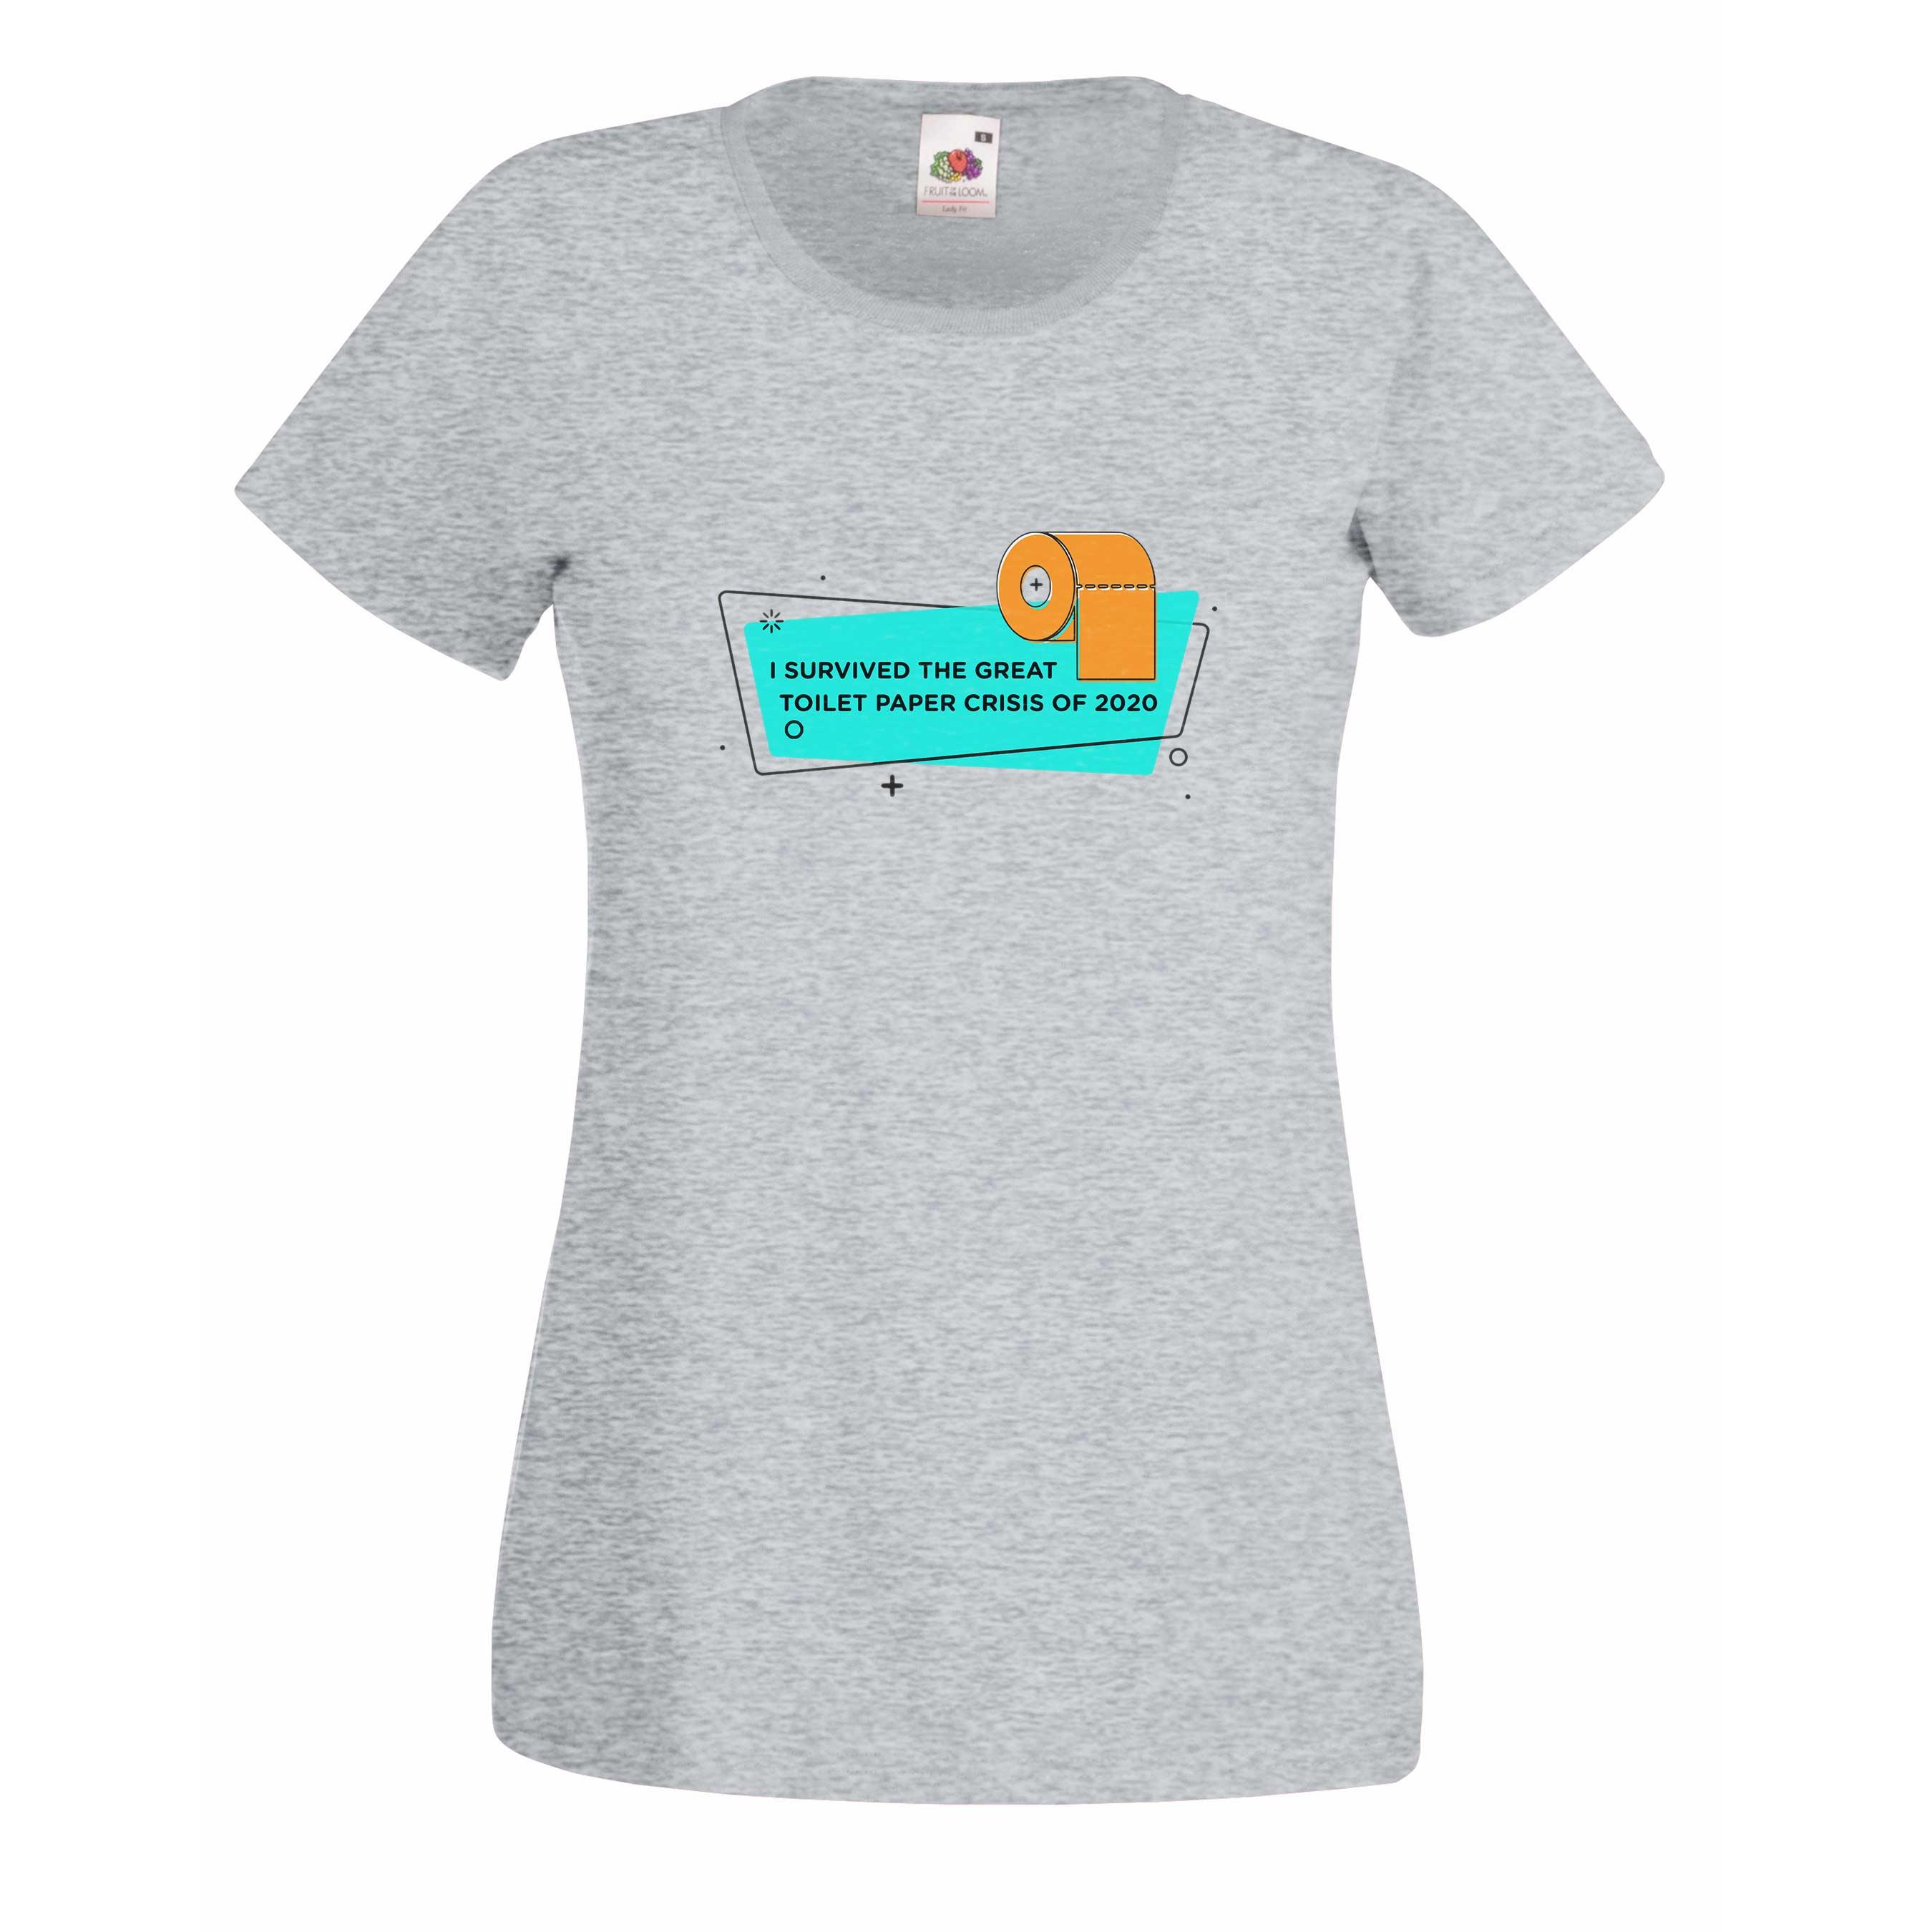 Toilet paper design for t-shirt, hoodie & sweatshirt